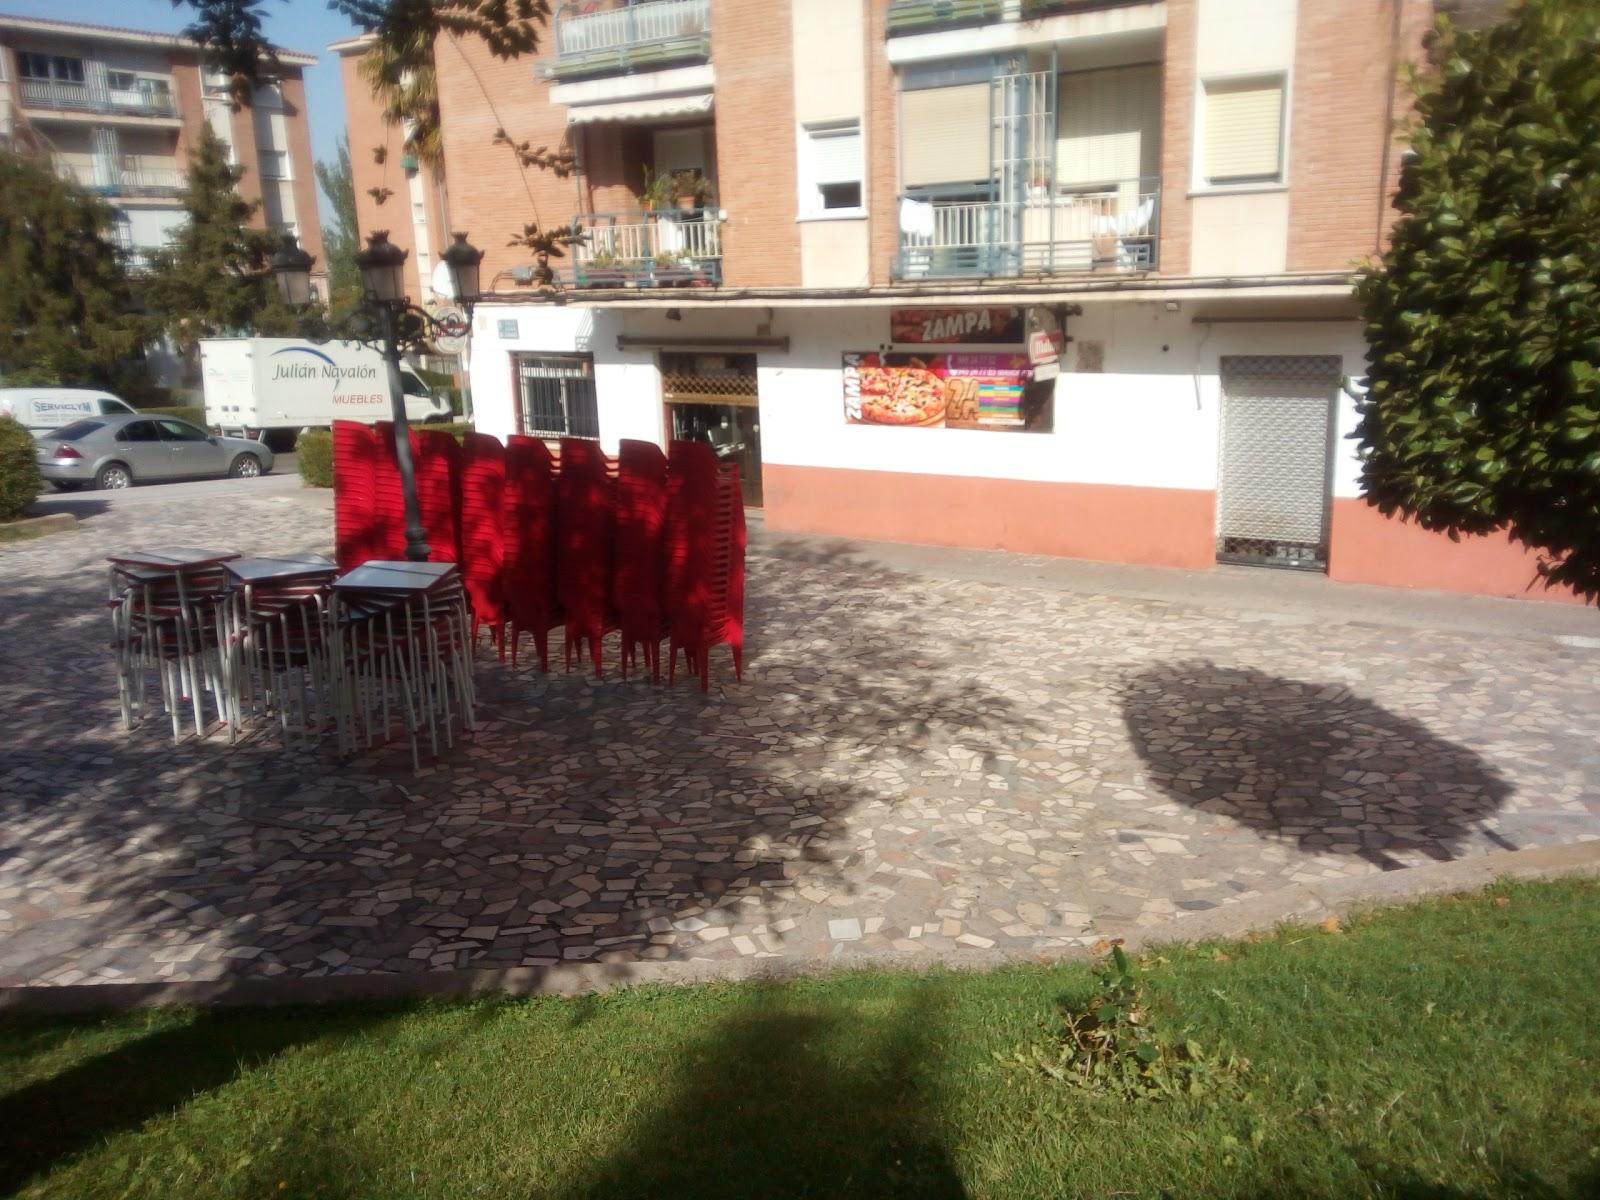 Pizzeria Zampa Informaci N Til Y Fotos # Muebles Navalon Guadalajara